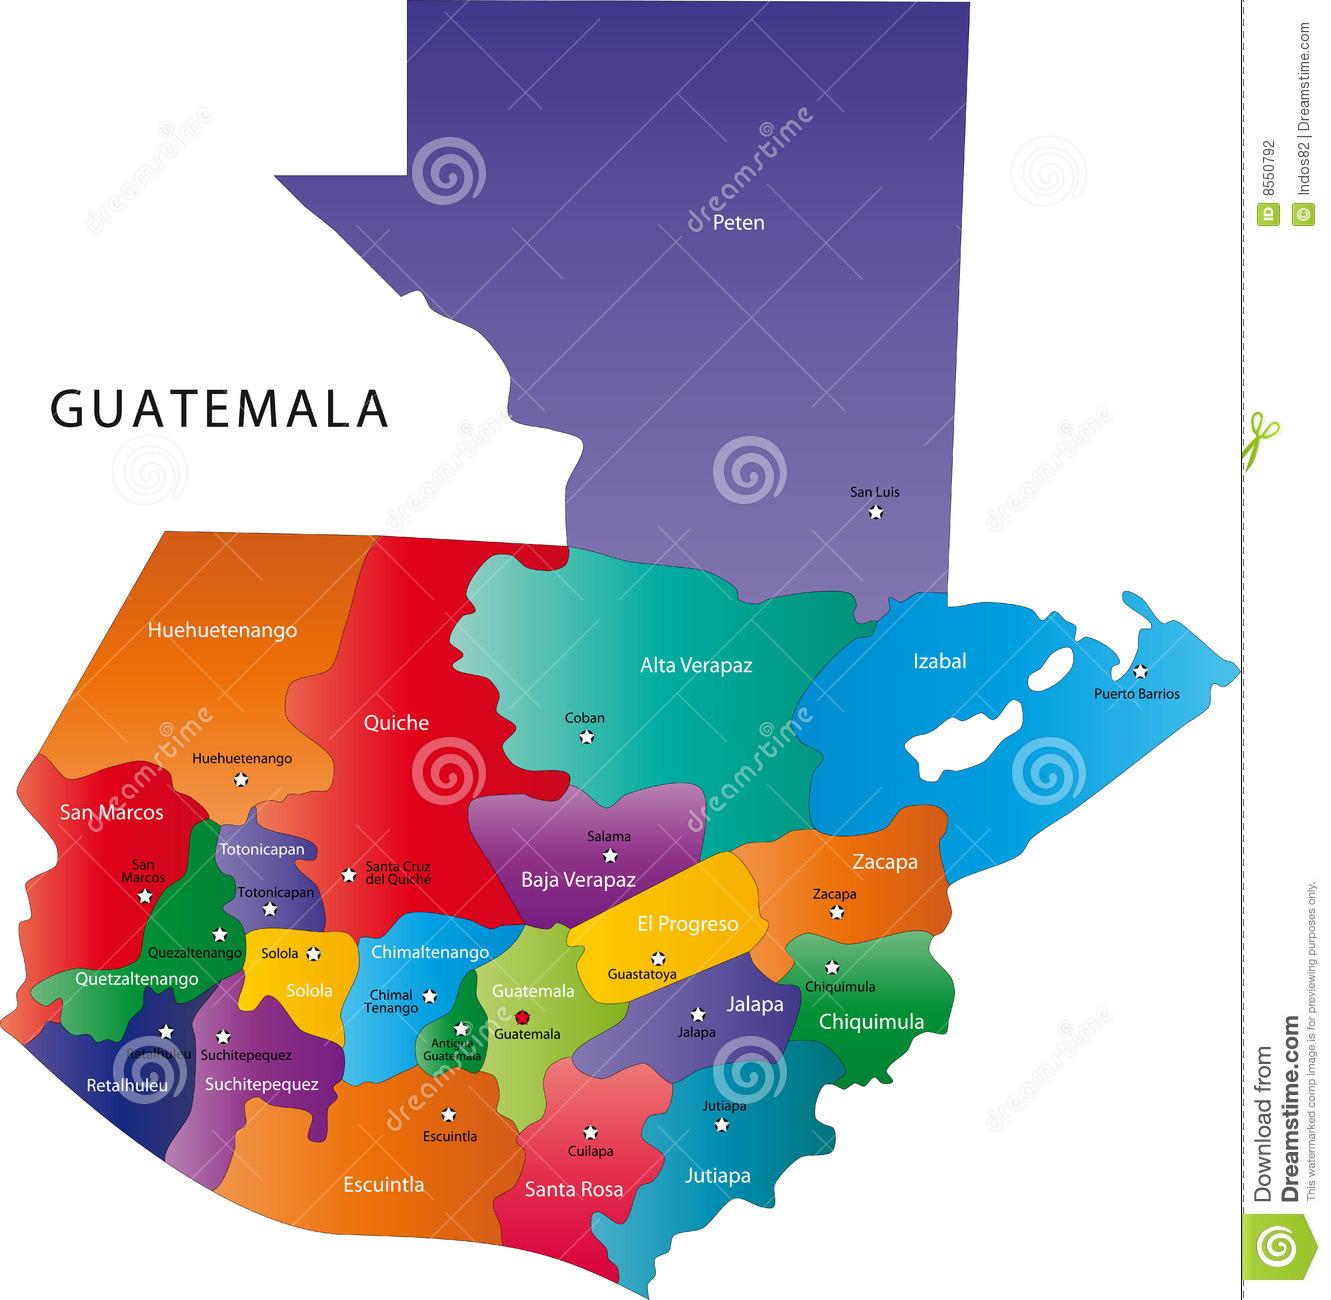 Guatemala clipart #11, Download drawings